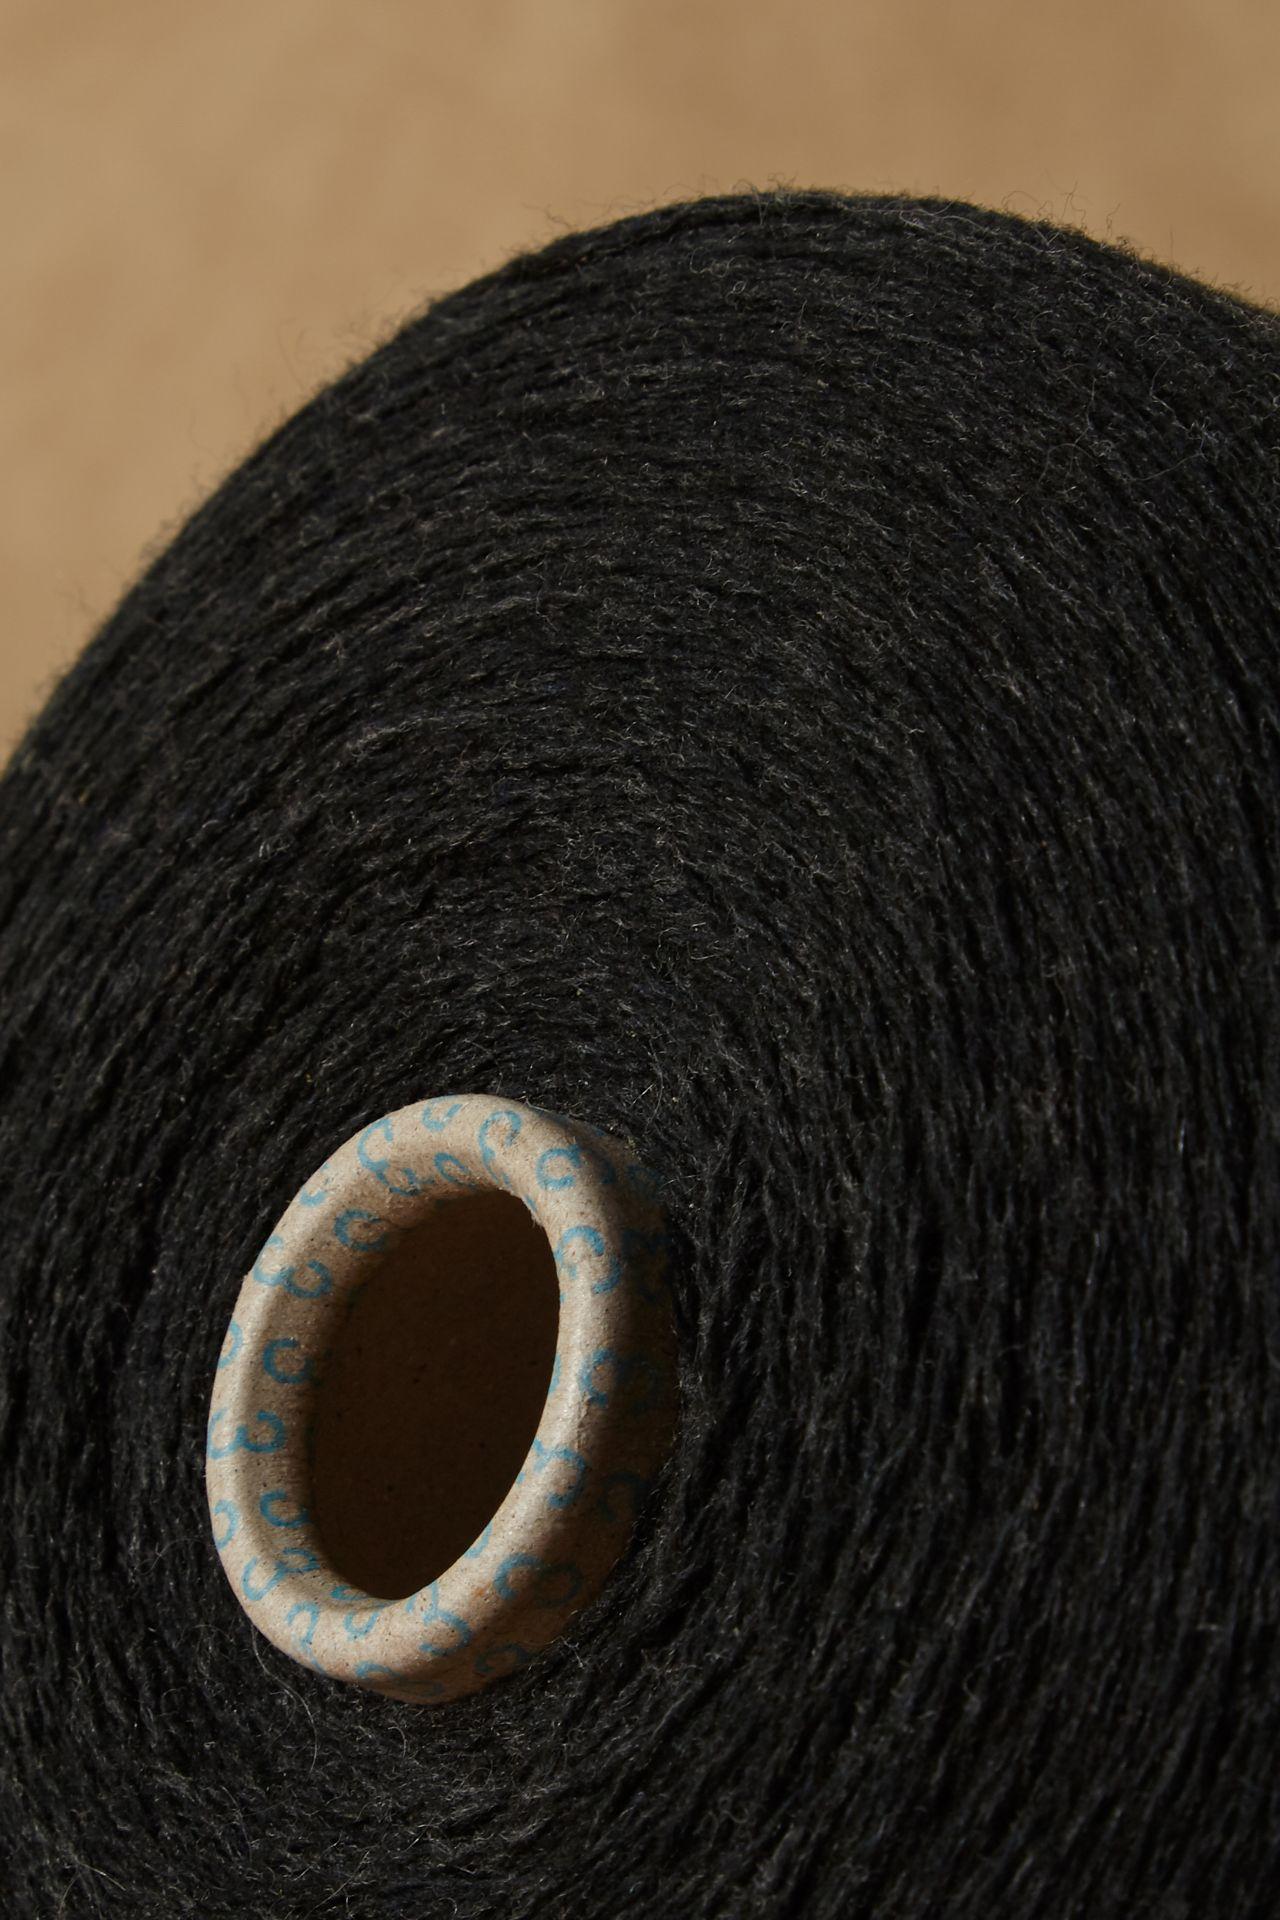 Dutch merino wool yarn detail.